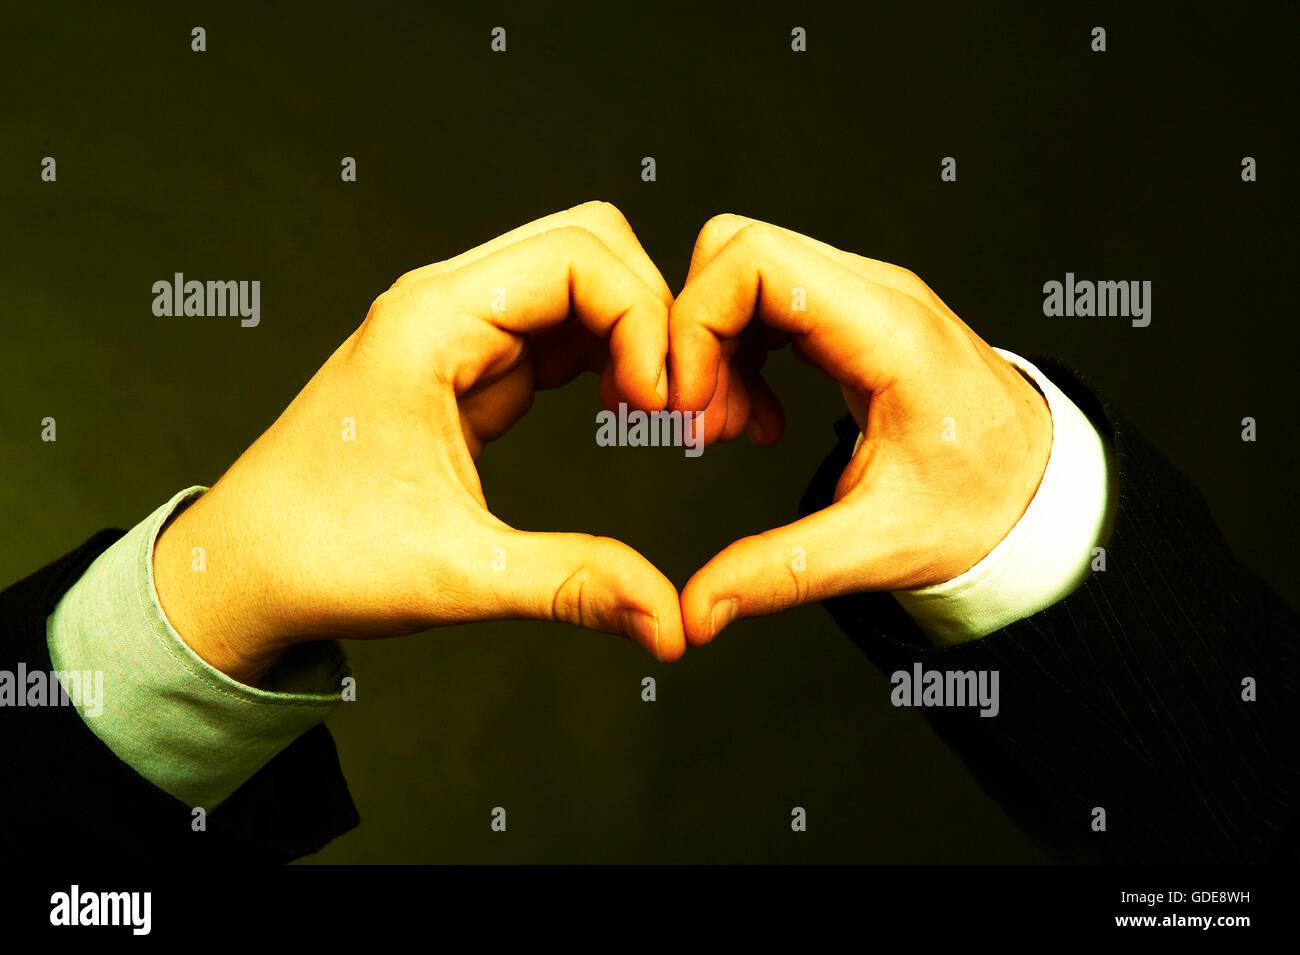 Hands,hand,Merger,union,unite,fit,business,men,economy,heart - Stock Image